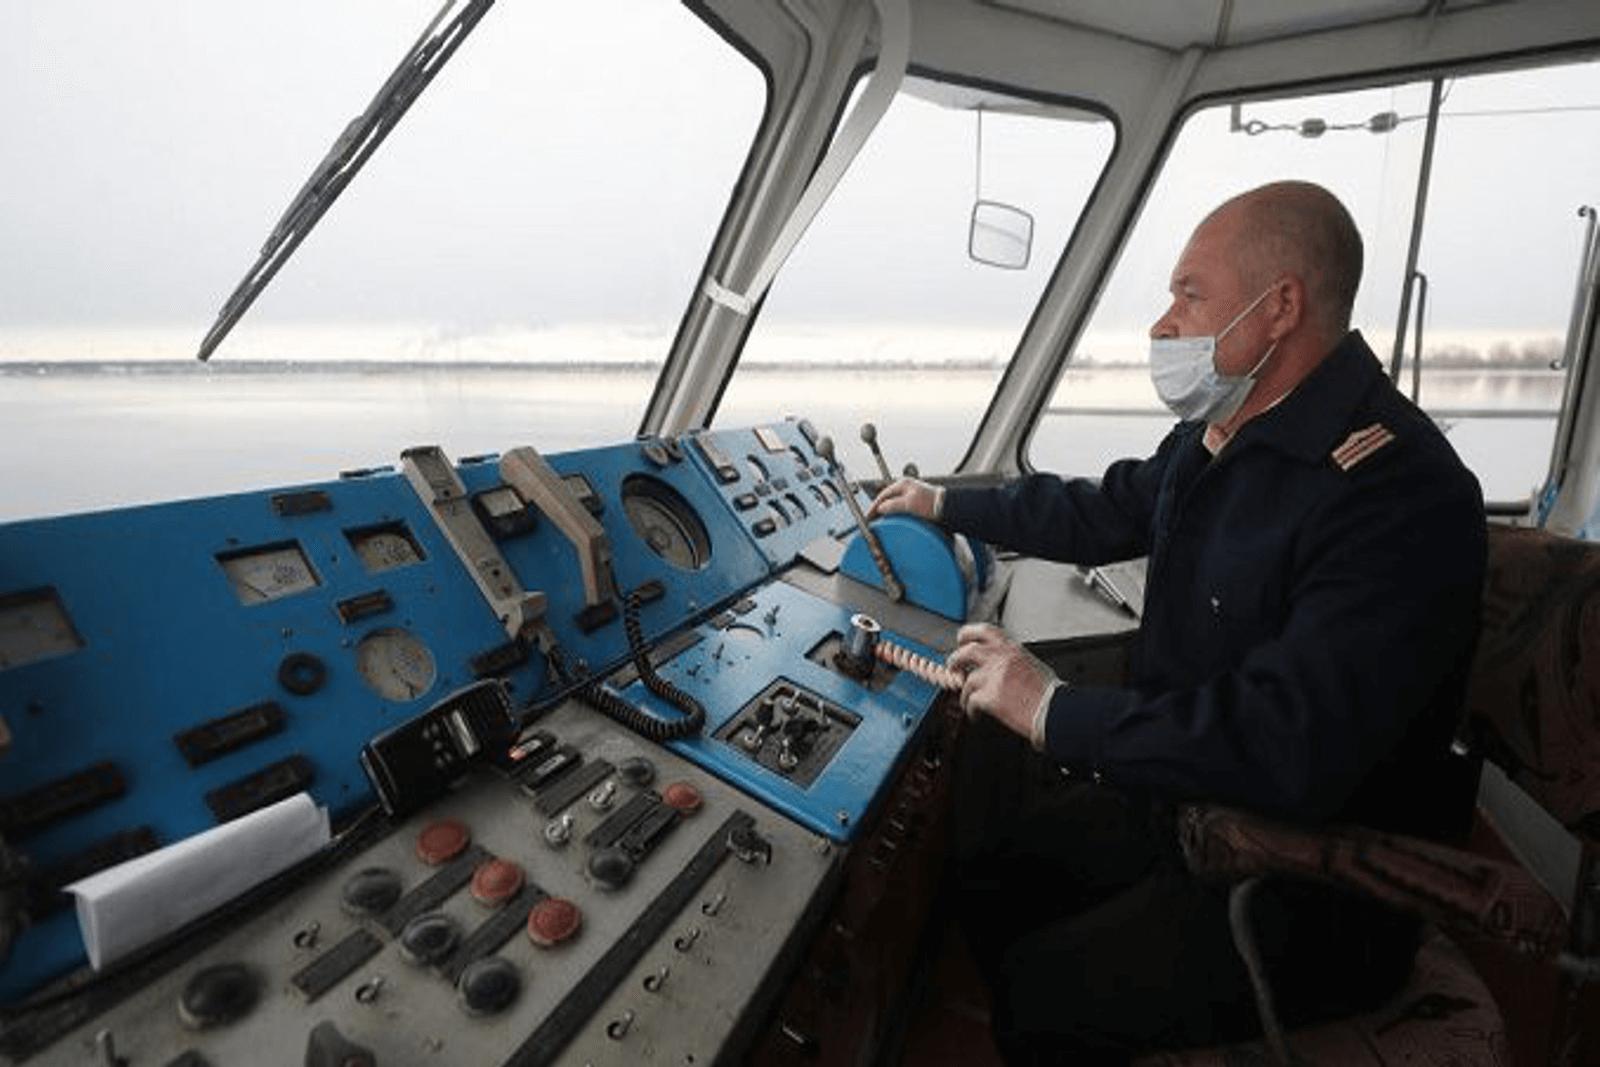 Coronavirus lockdown: Seafarers stranded at sea